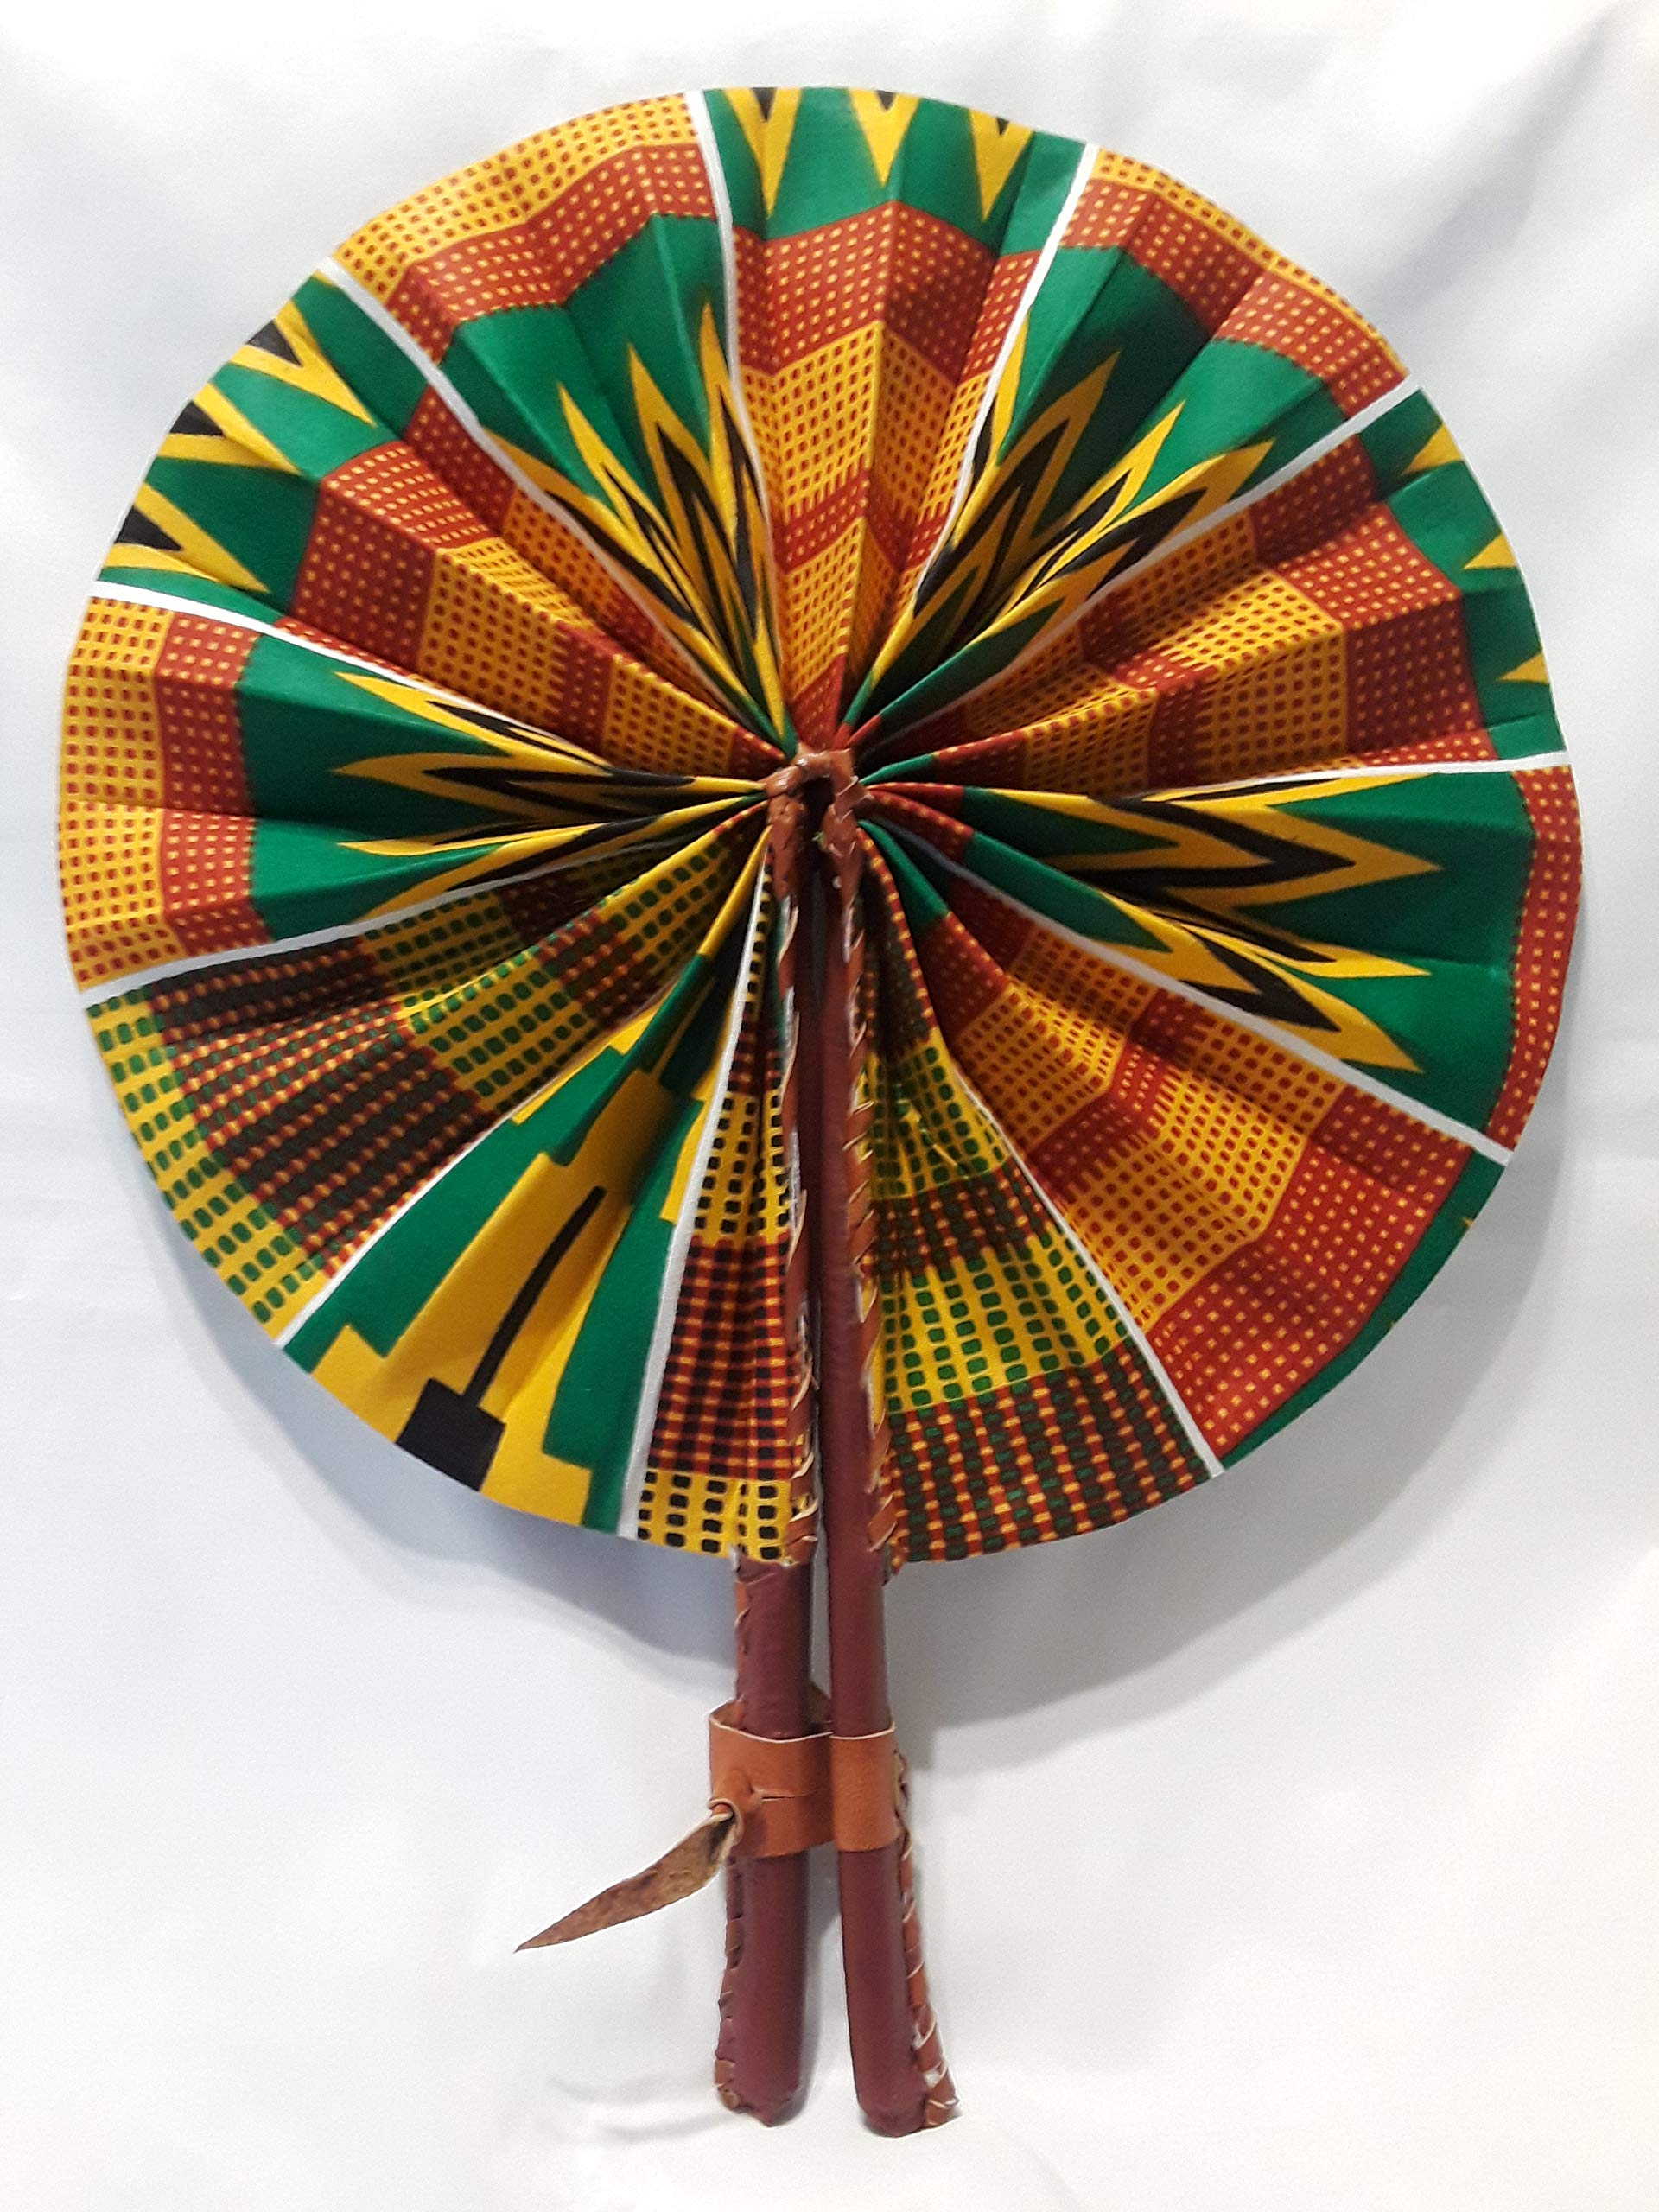 African TV African Fabric Handmade Folding Fan, African Hand-held Folding Fan by African TV Network